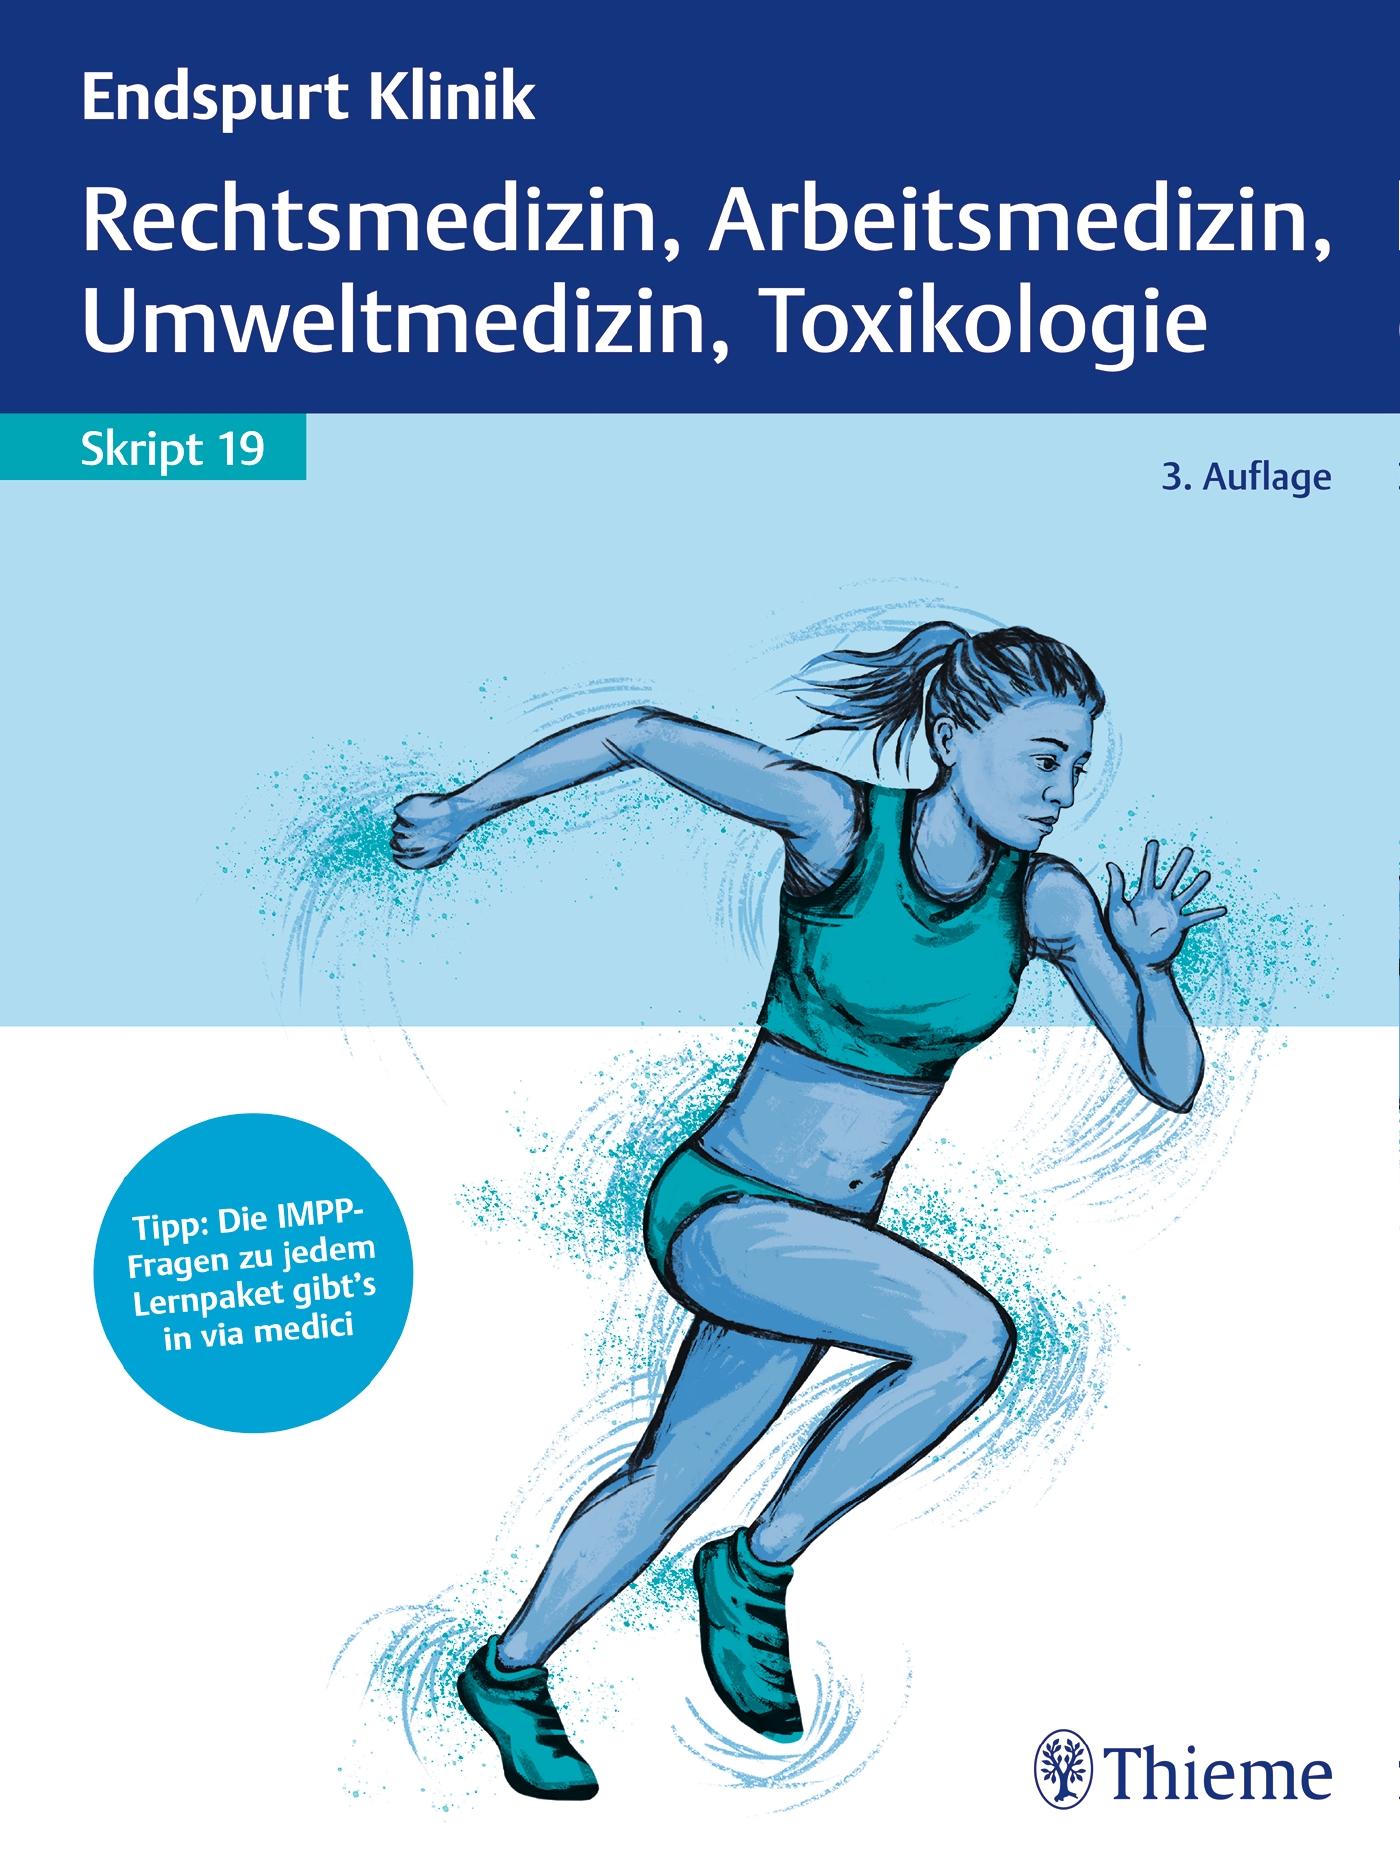 Endspurt Klinik Skript 19: Rechtsmedizin, Arbeitsmedizin, Umweltmedizin, Toxikologie